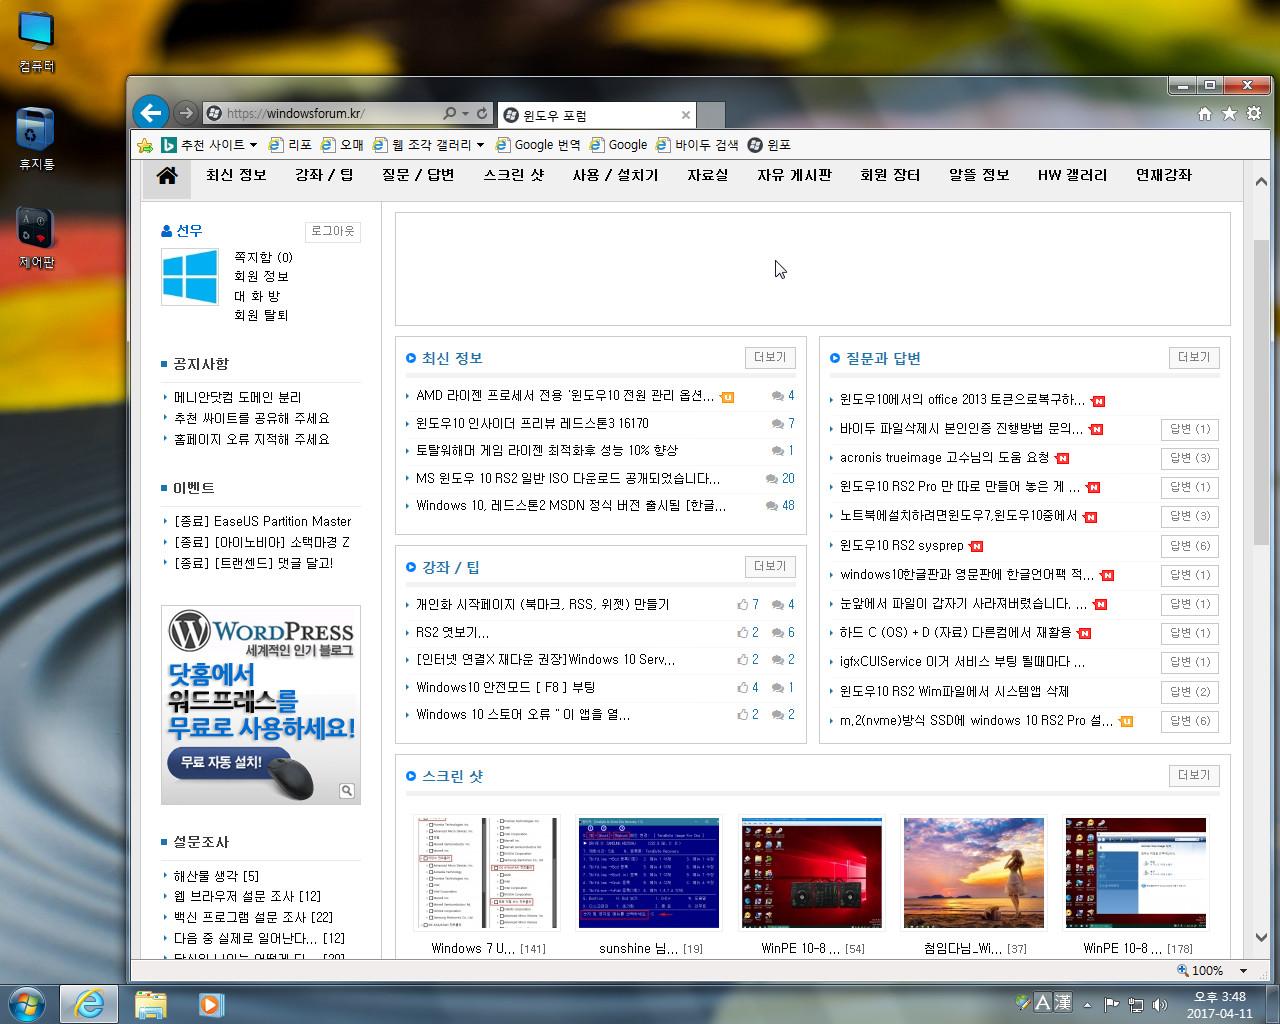 Windows 7 Ultimate_x64_Lite_KO_KY_OldMaC23.jpg